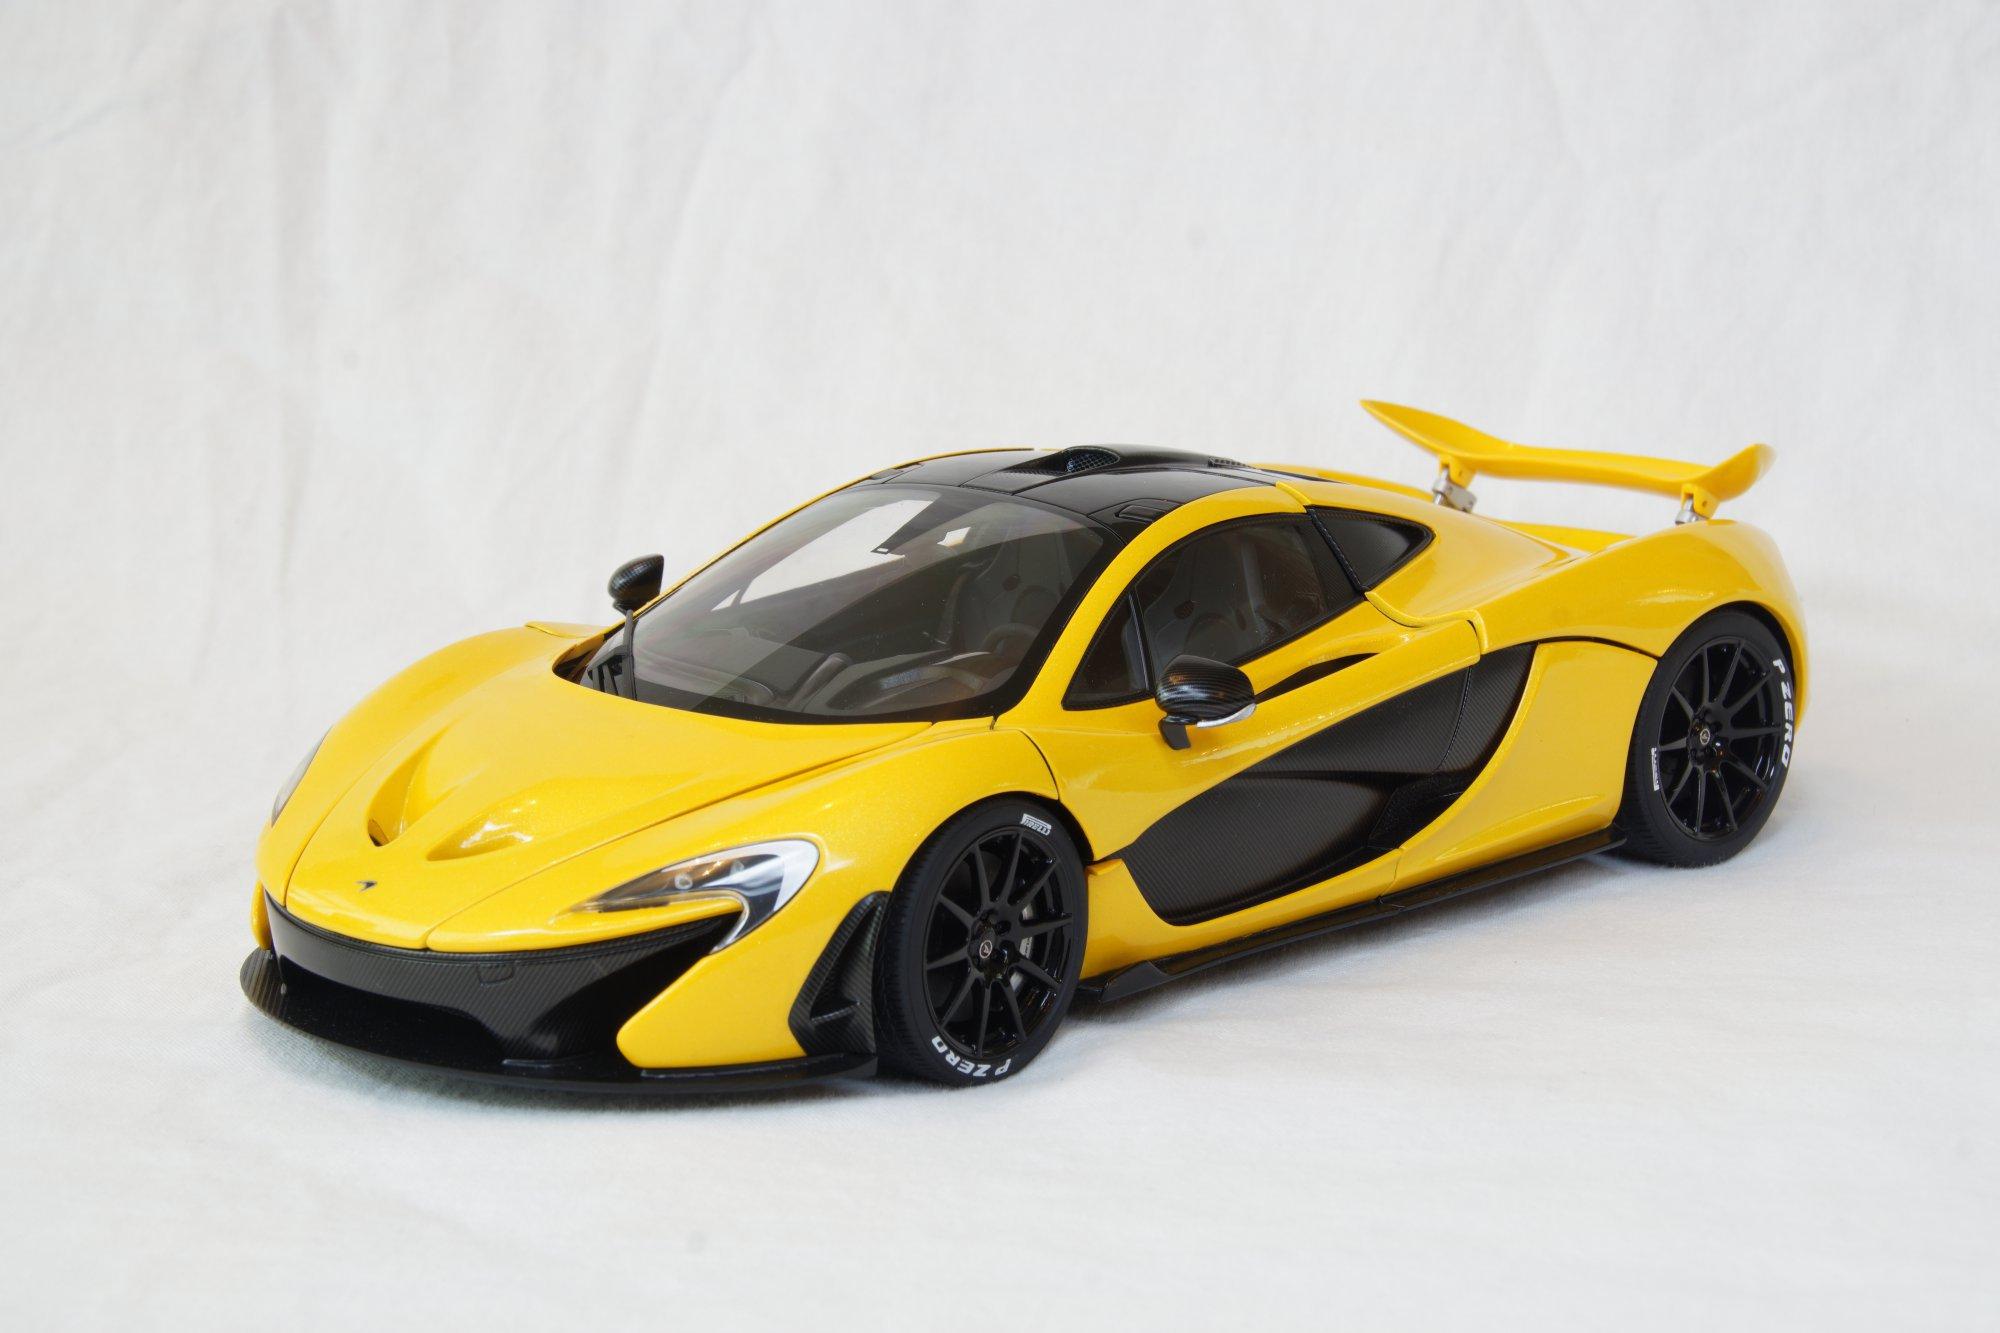 AutoArt Signature Series McLaren P1 1/18